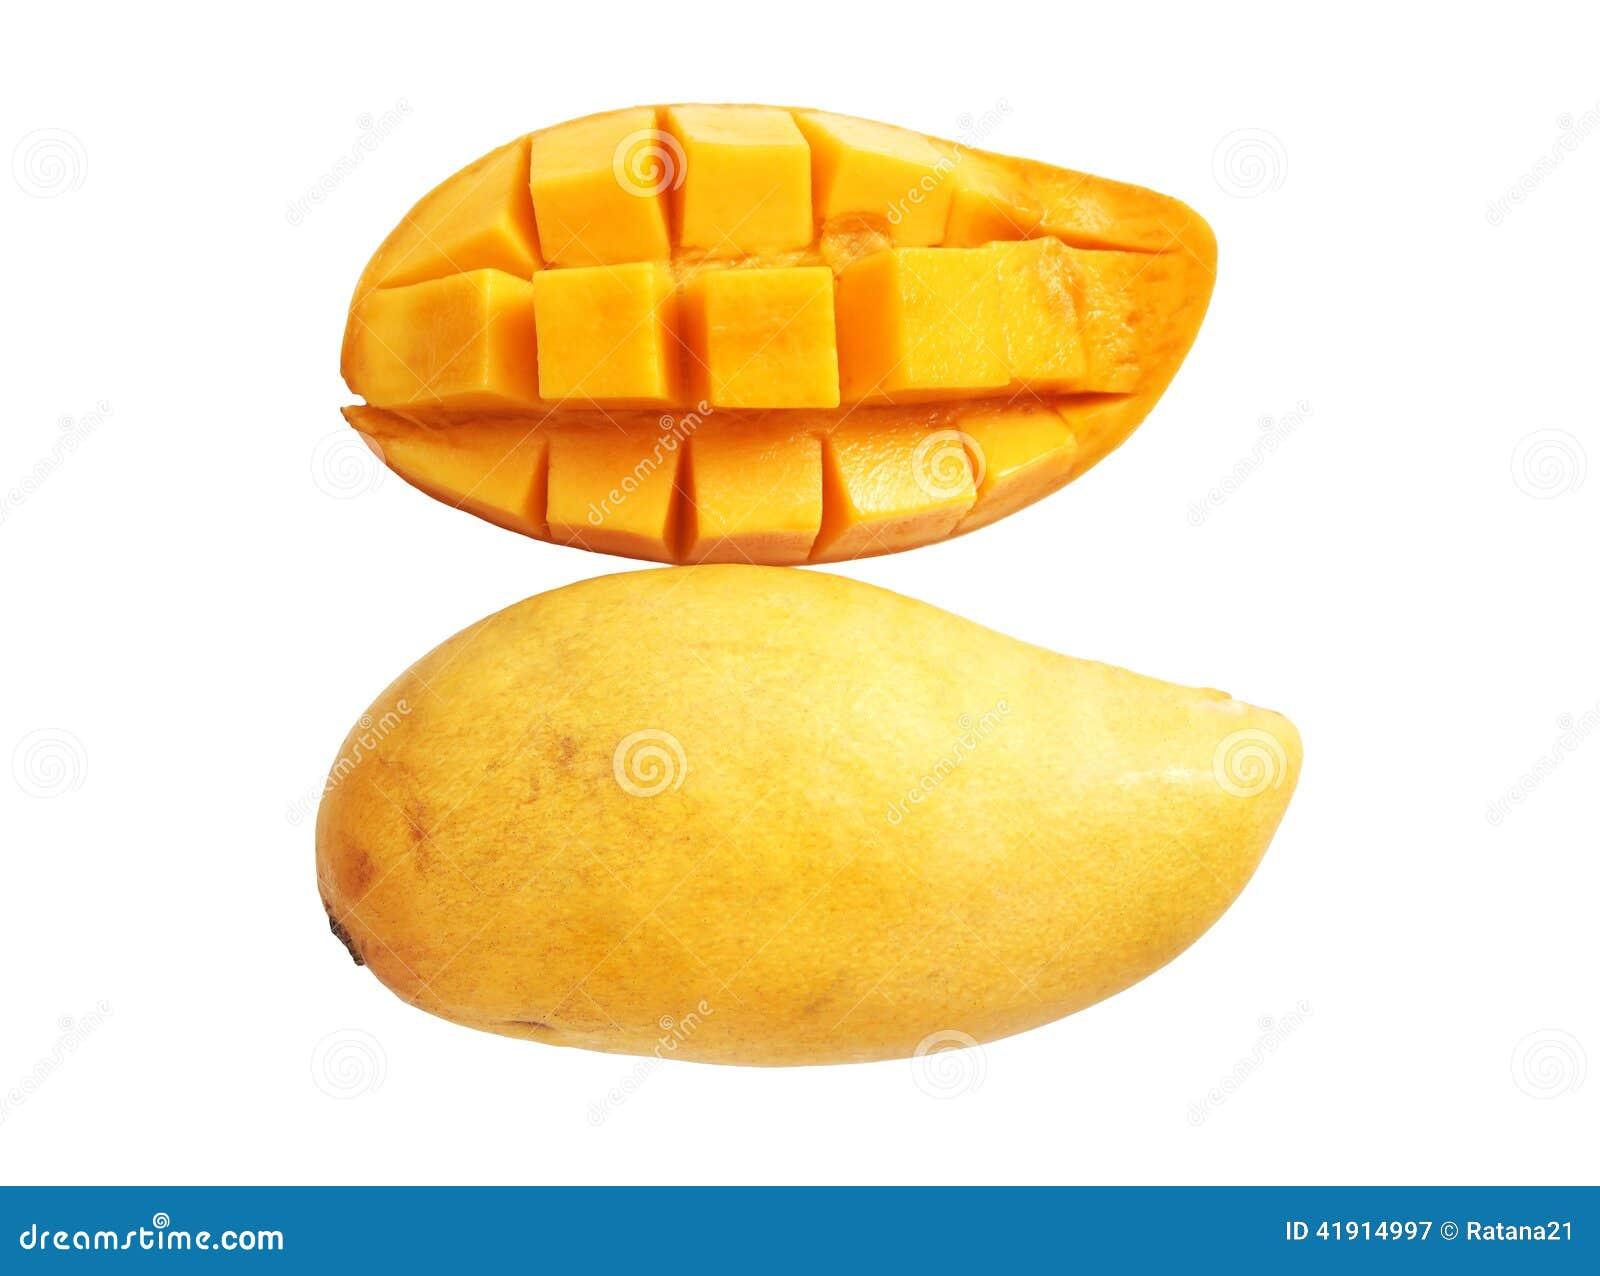 Mango maduro dulce en el fondo blanco